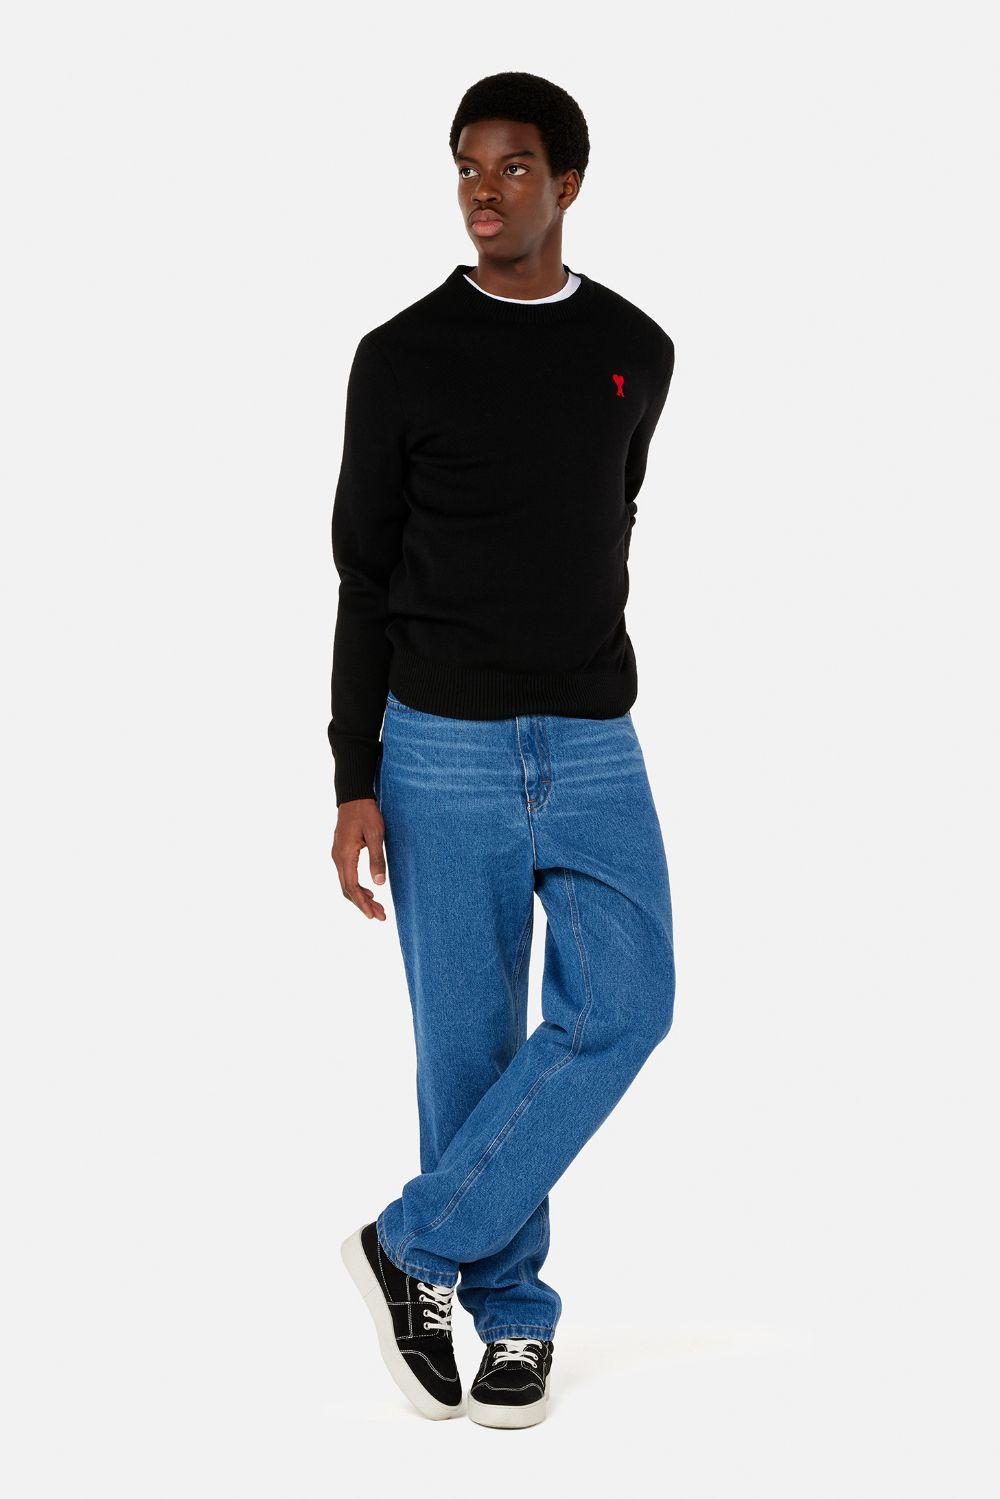 Ami de coeur sweater Black in Wool Man AMI - ALEXANDRE MATTIUSSI   Sweaters   BFHK001.001001